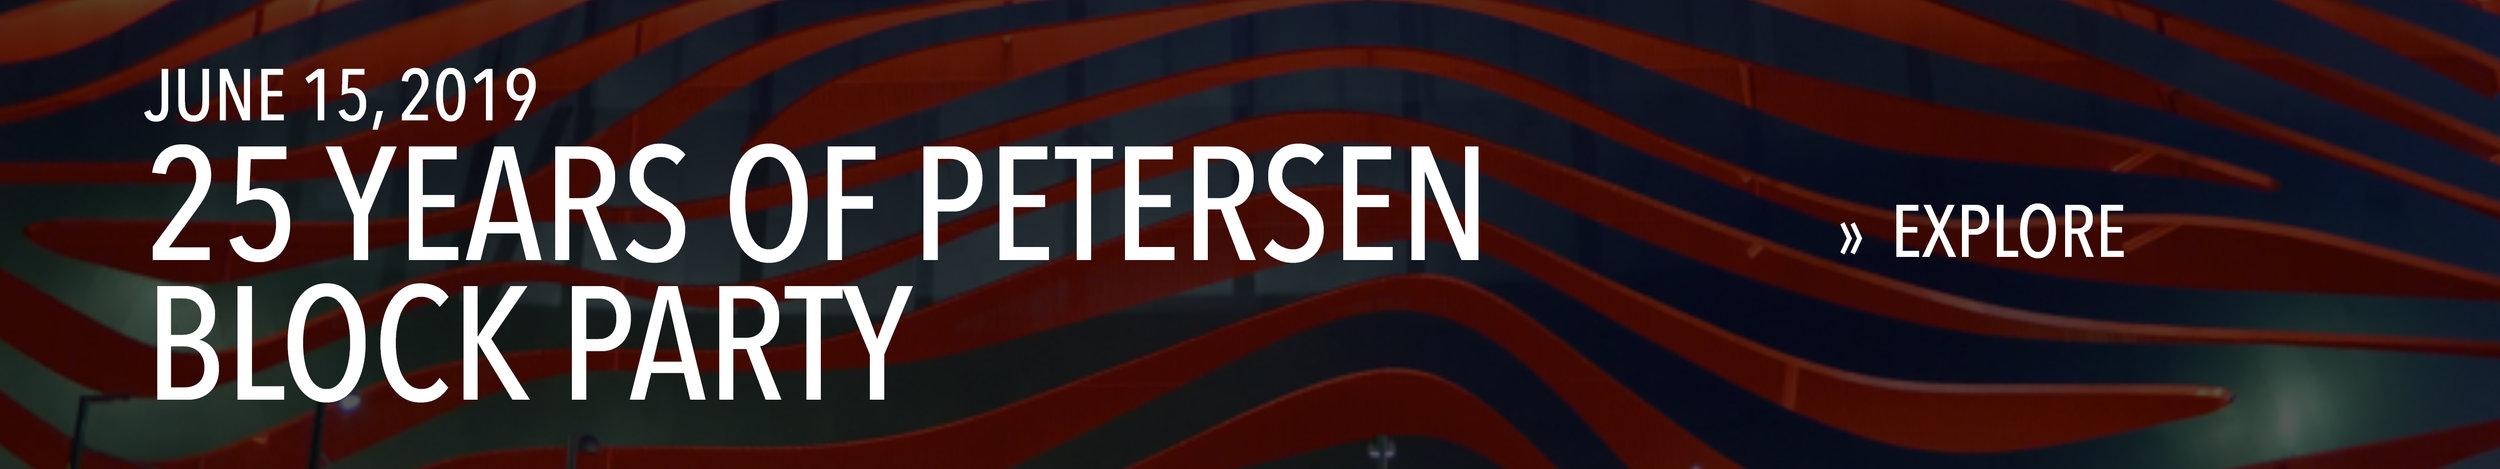 25 Years of Petersen Block Party on June 15, 2019